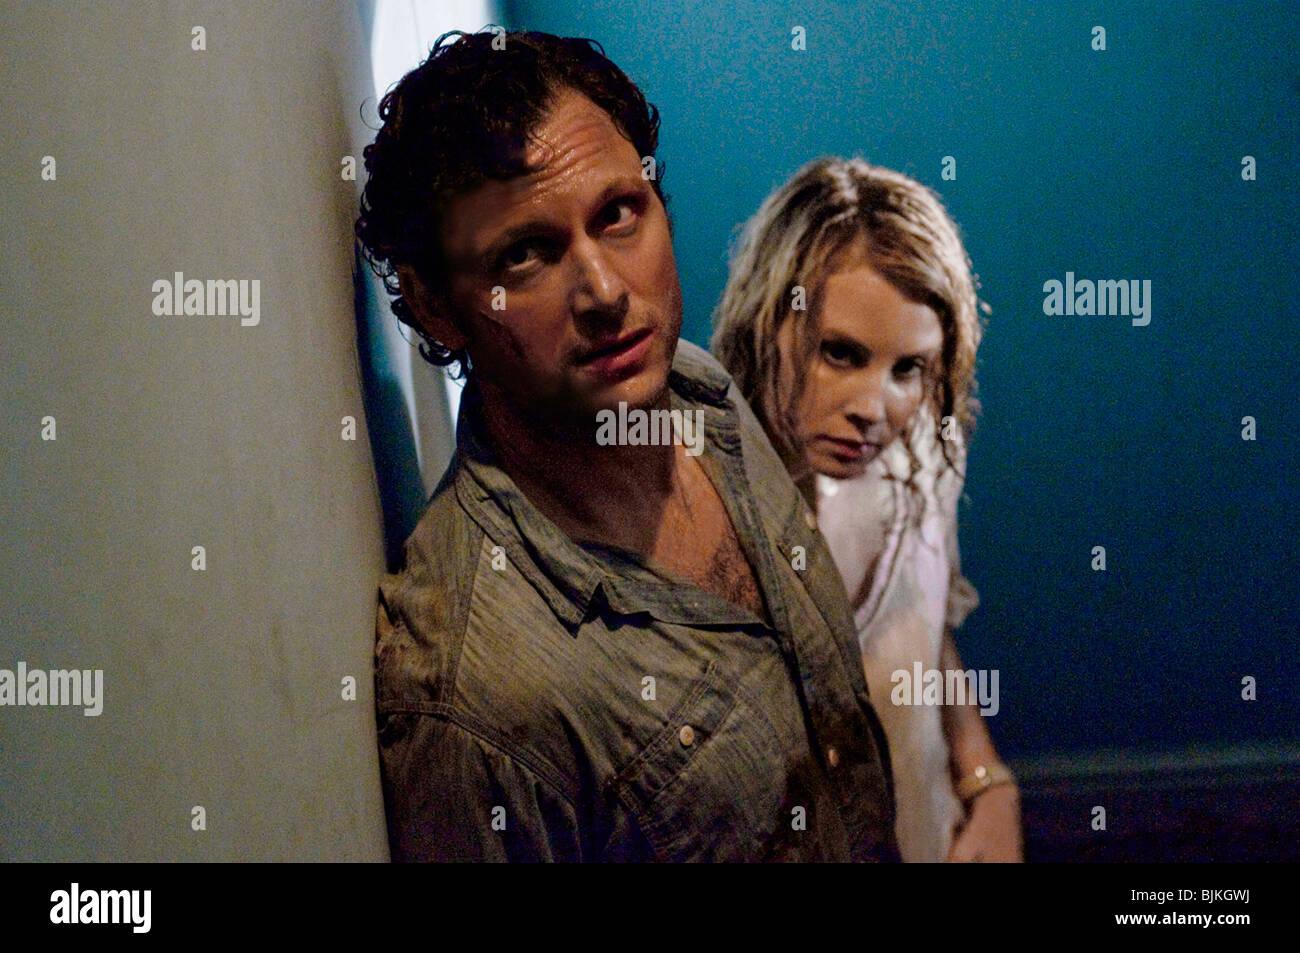 THE LAST HOUSE ON THE LEFT (2009) TONY GOLDWYN, MONICA POTTER DENNIS LLIADIS (DIR) 003 - Stock Image